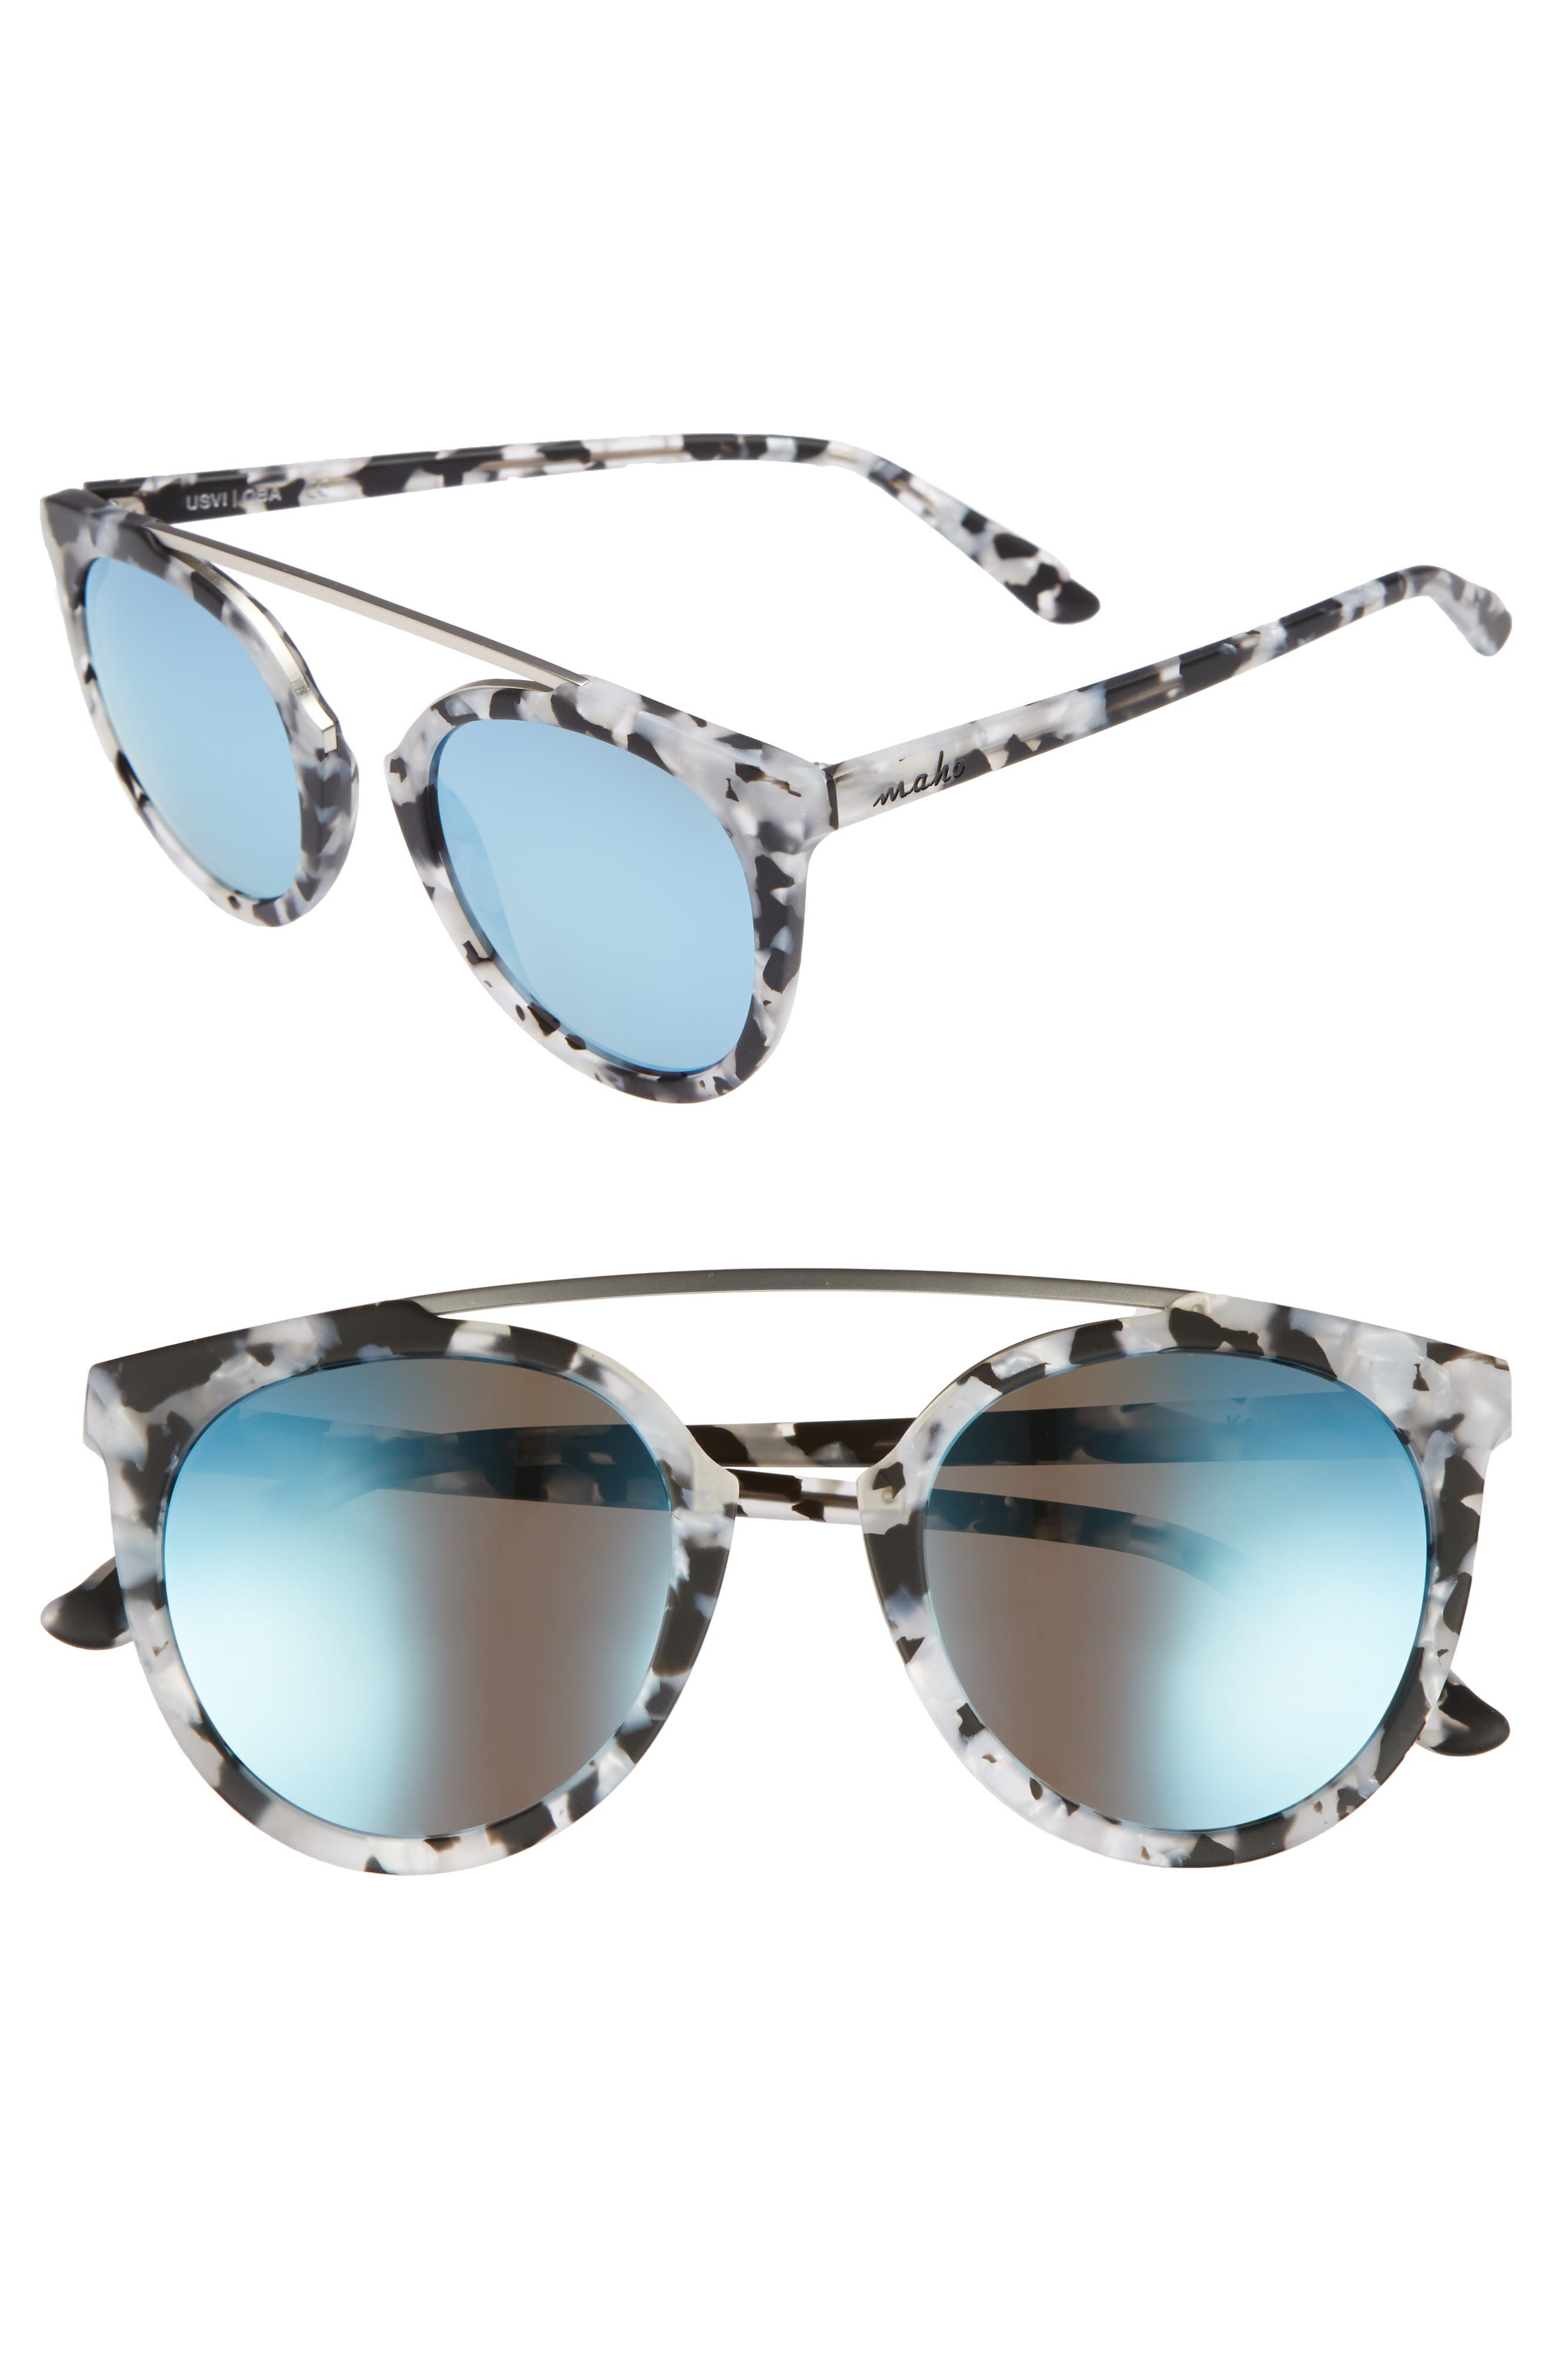 Key West 50mm Polarized Aviator Sunglasses,                             Main thumbnail 1, color,                             MARBLE